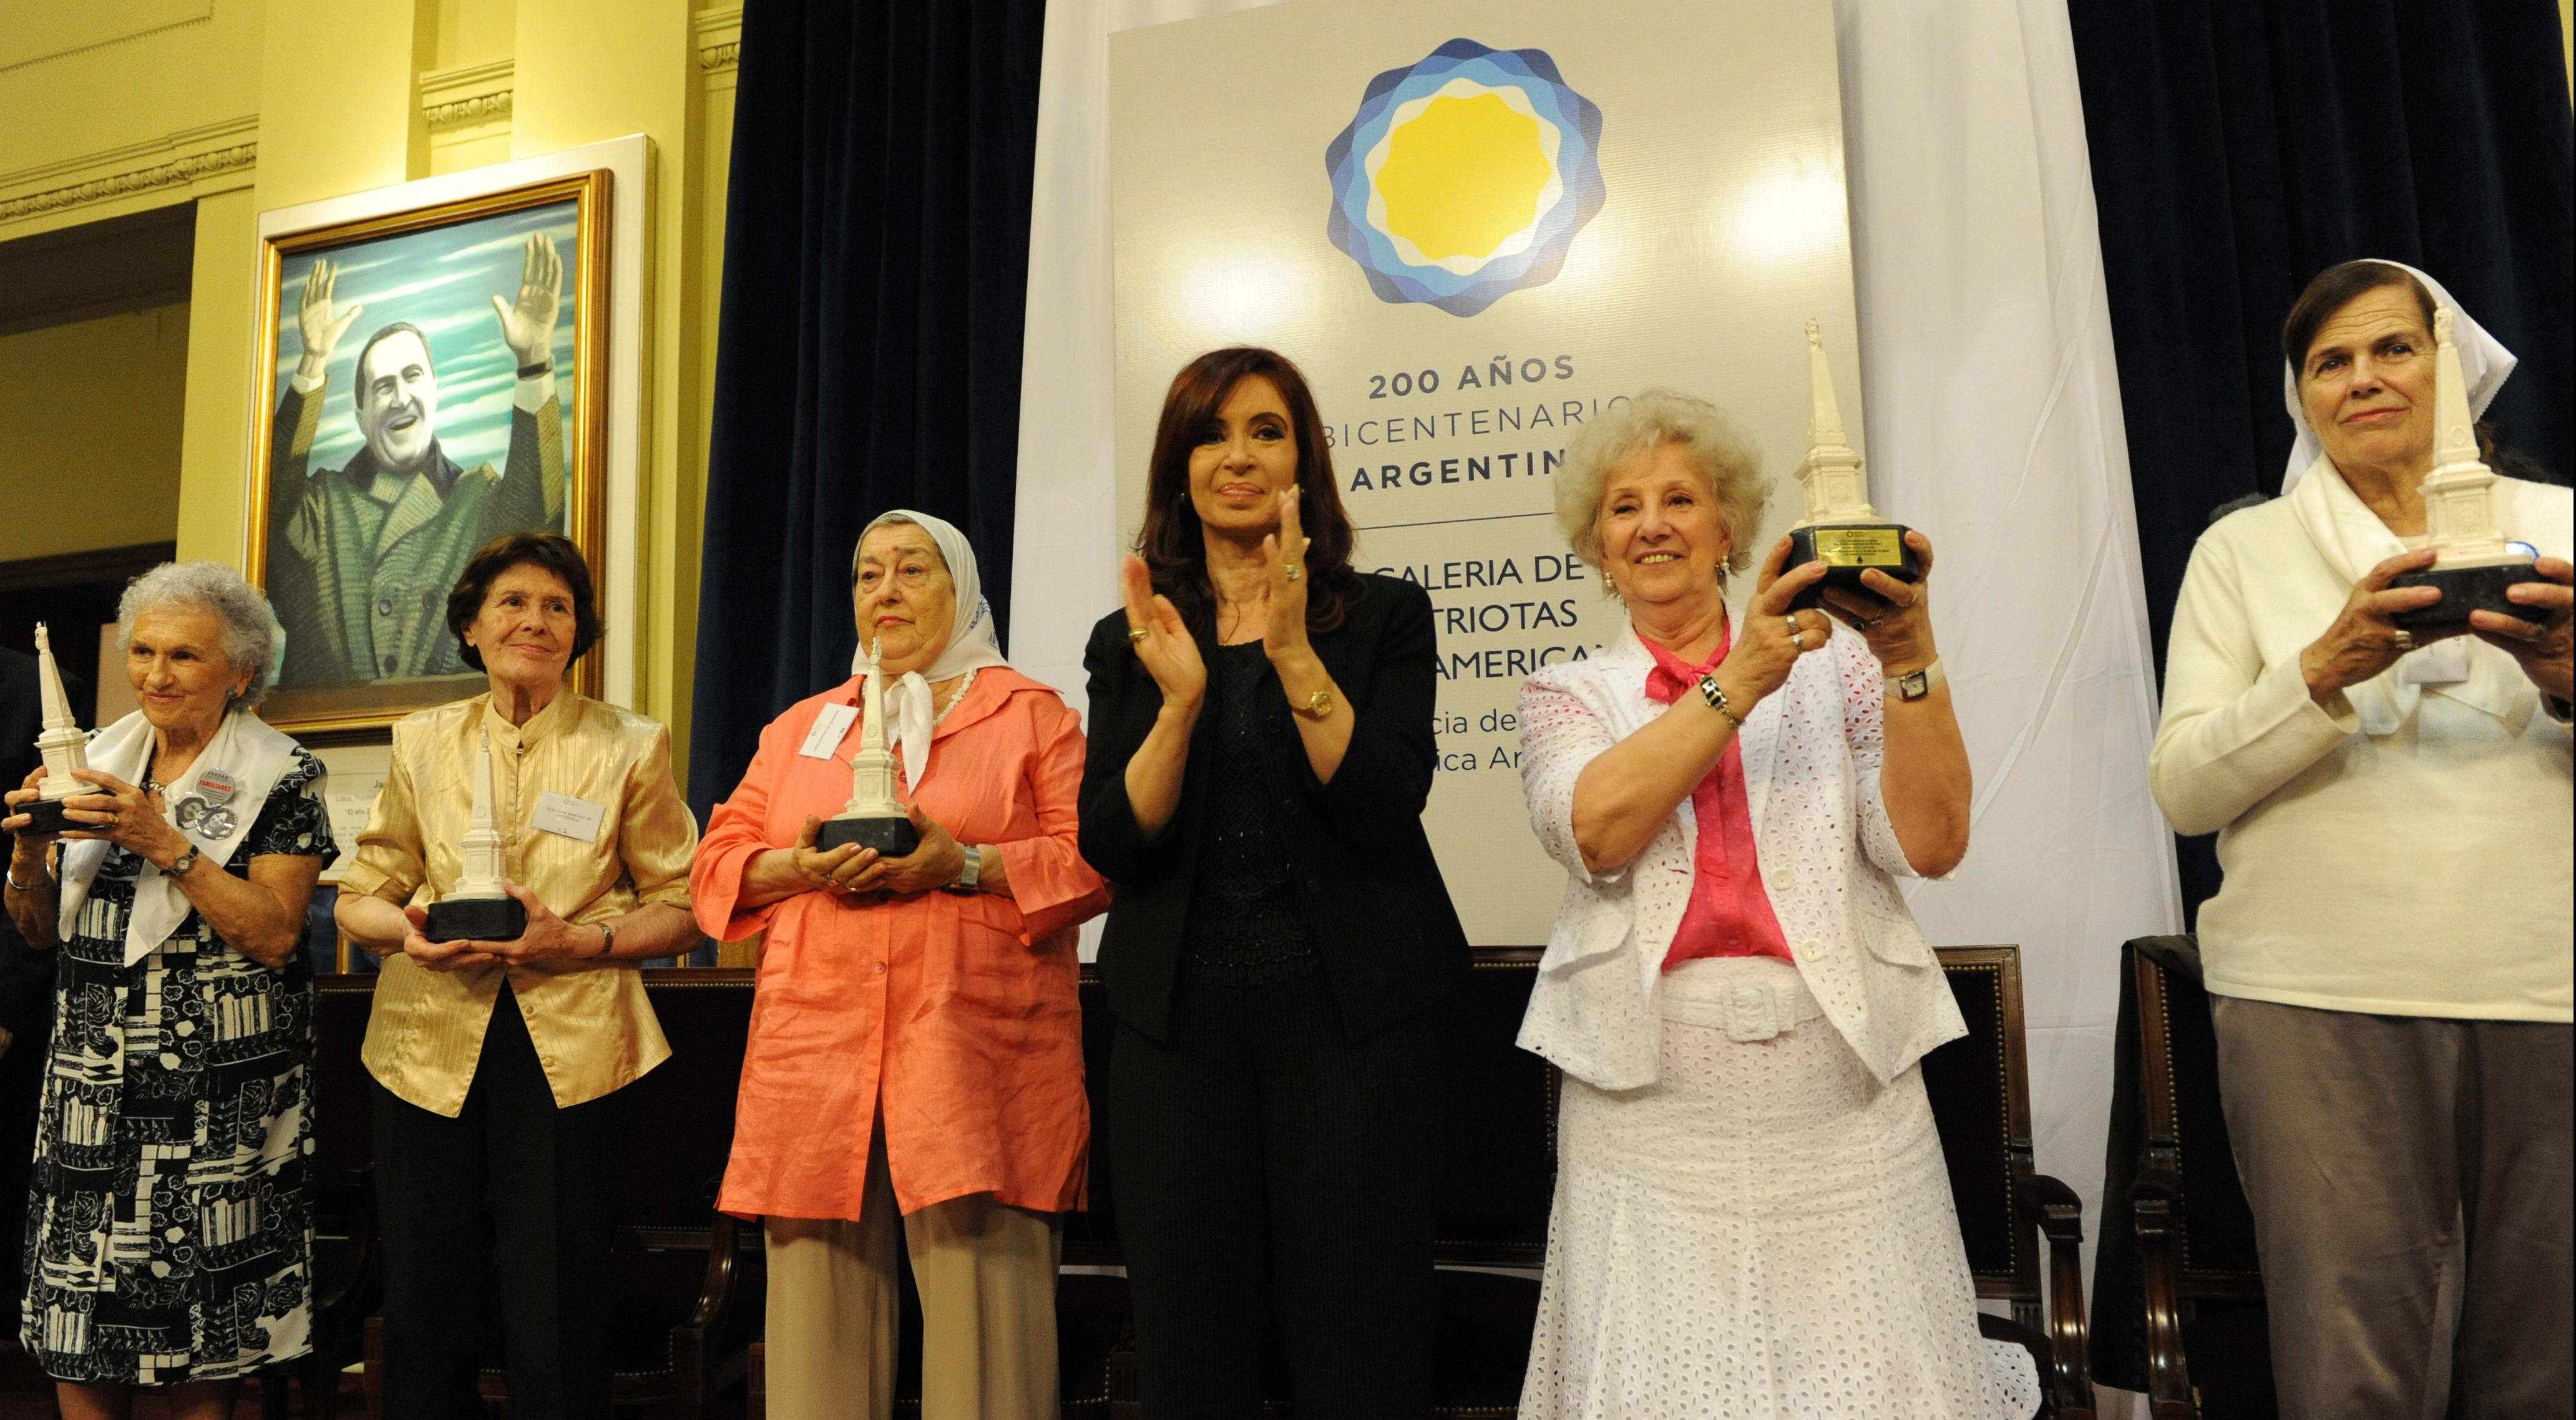 About Cristina Fernández De Kirchner